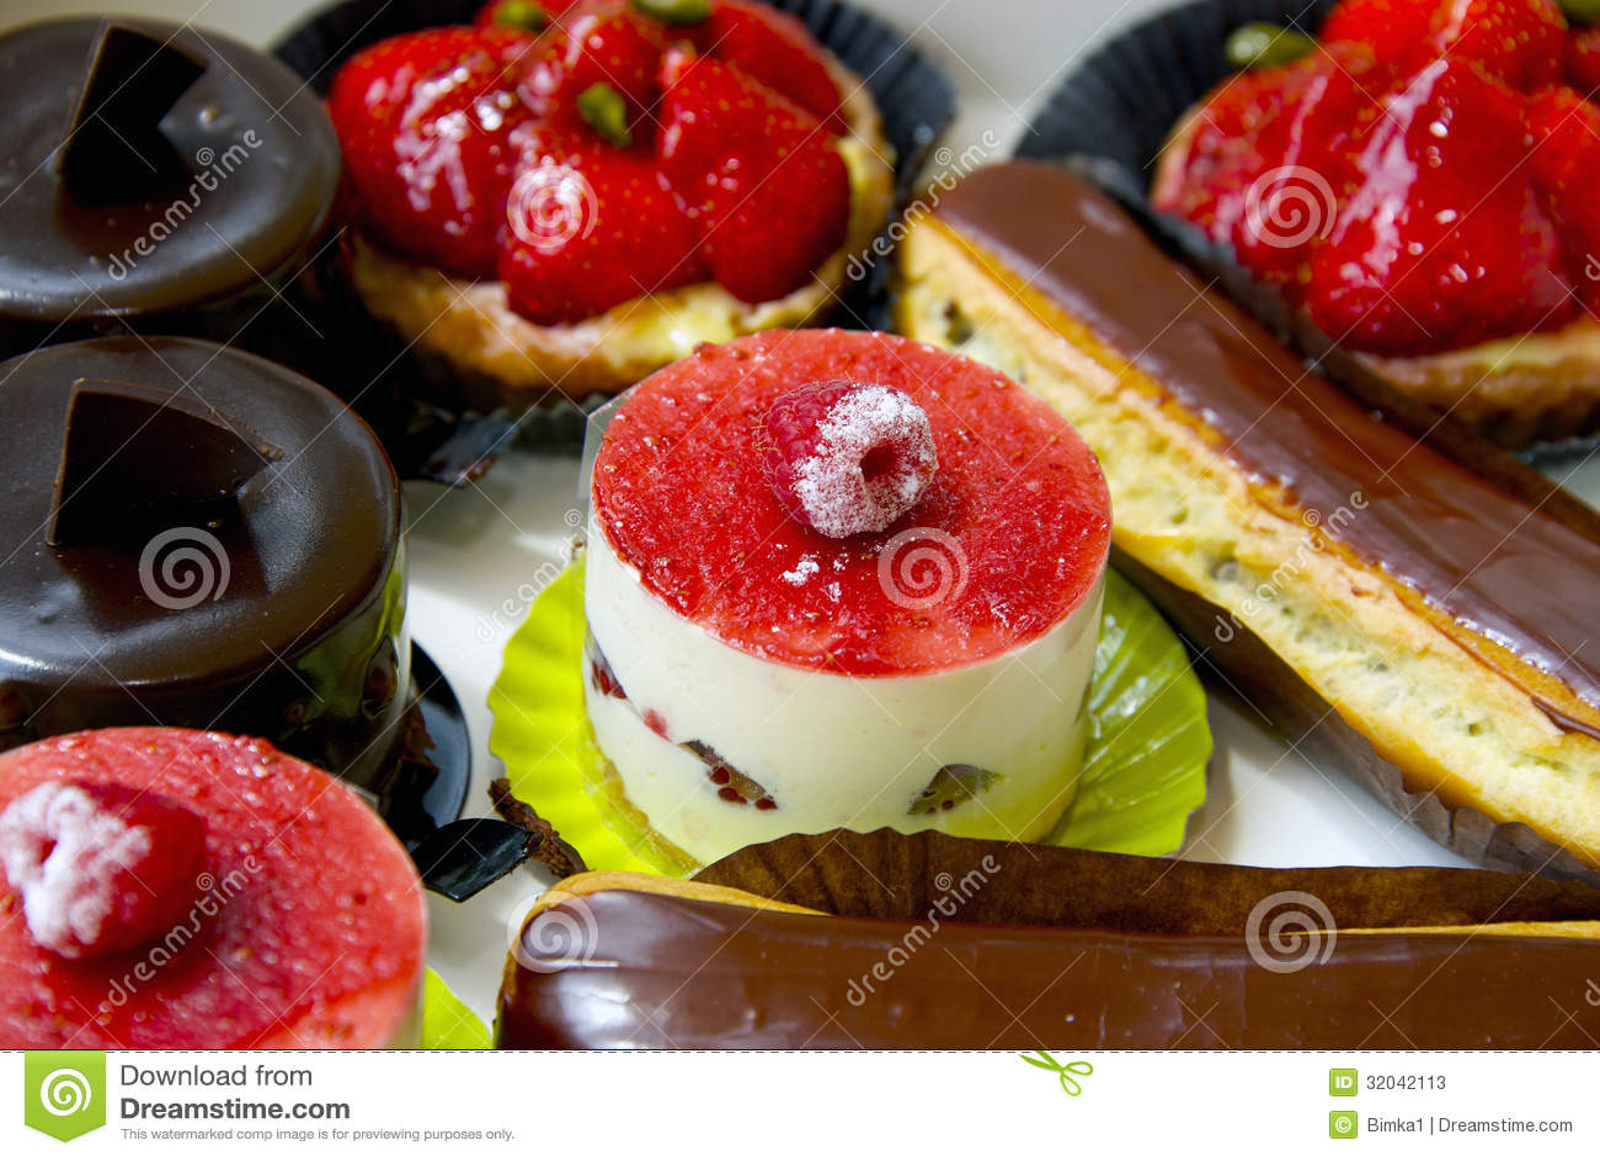 dessert french food stock photos image 32042113. Black Bedroom Furniture Sets. Home Design Ideas